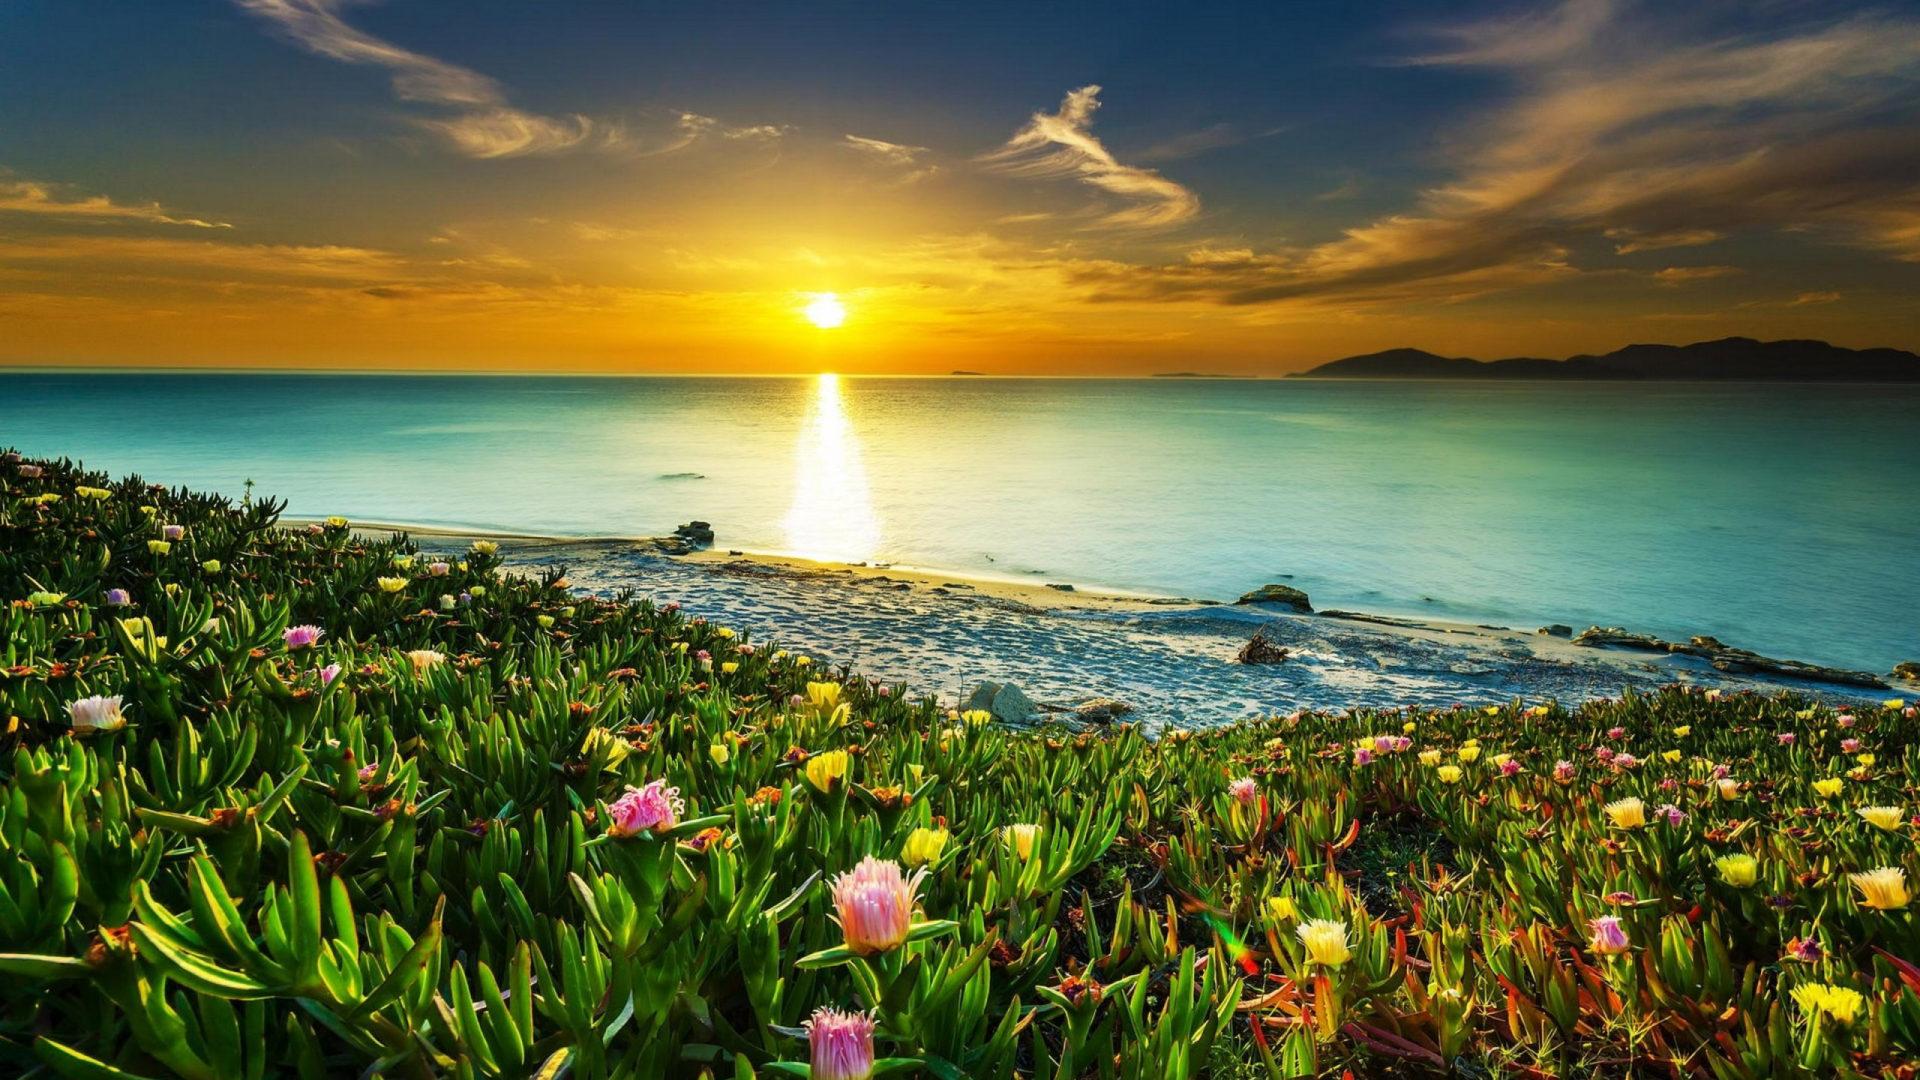 Fall Flowers Wallpaper Free Sea Coast Meadow With Tropical Flowers Sandy Beach Calm